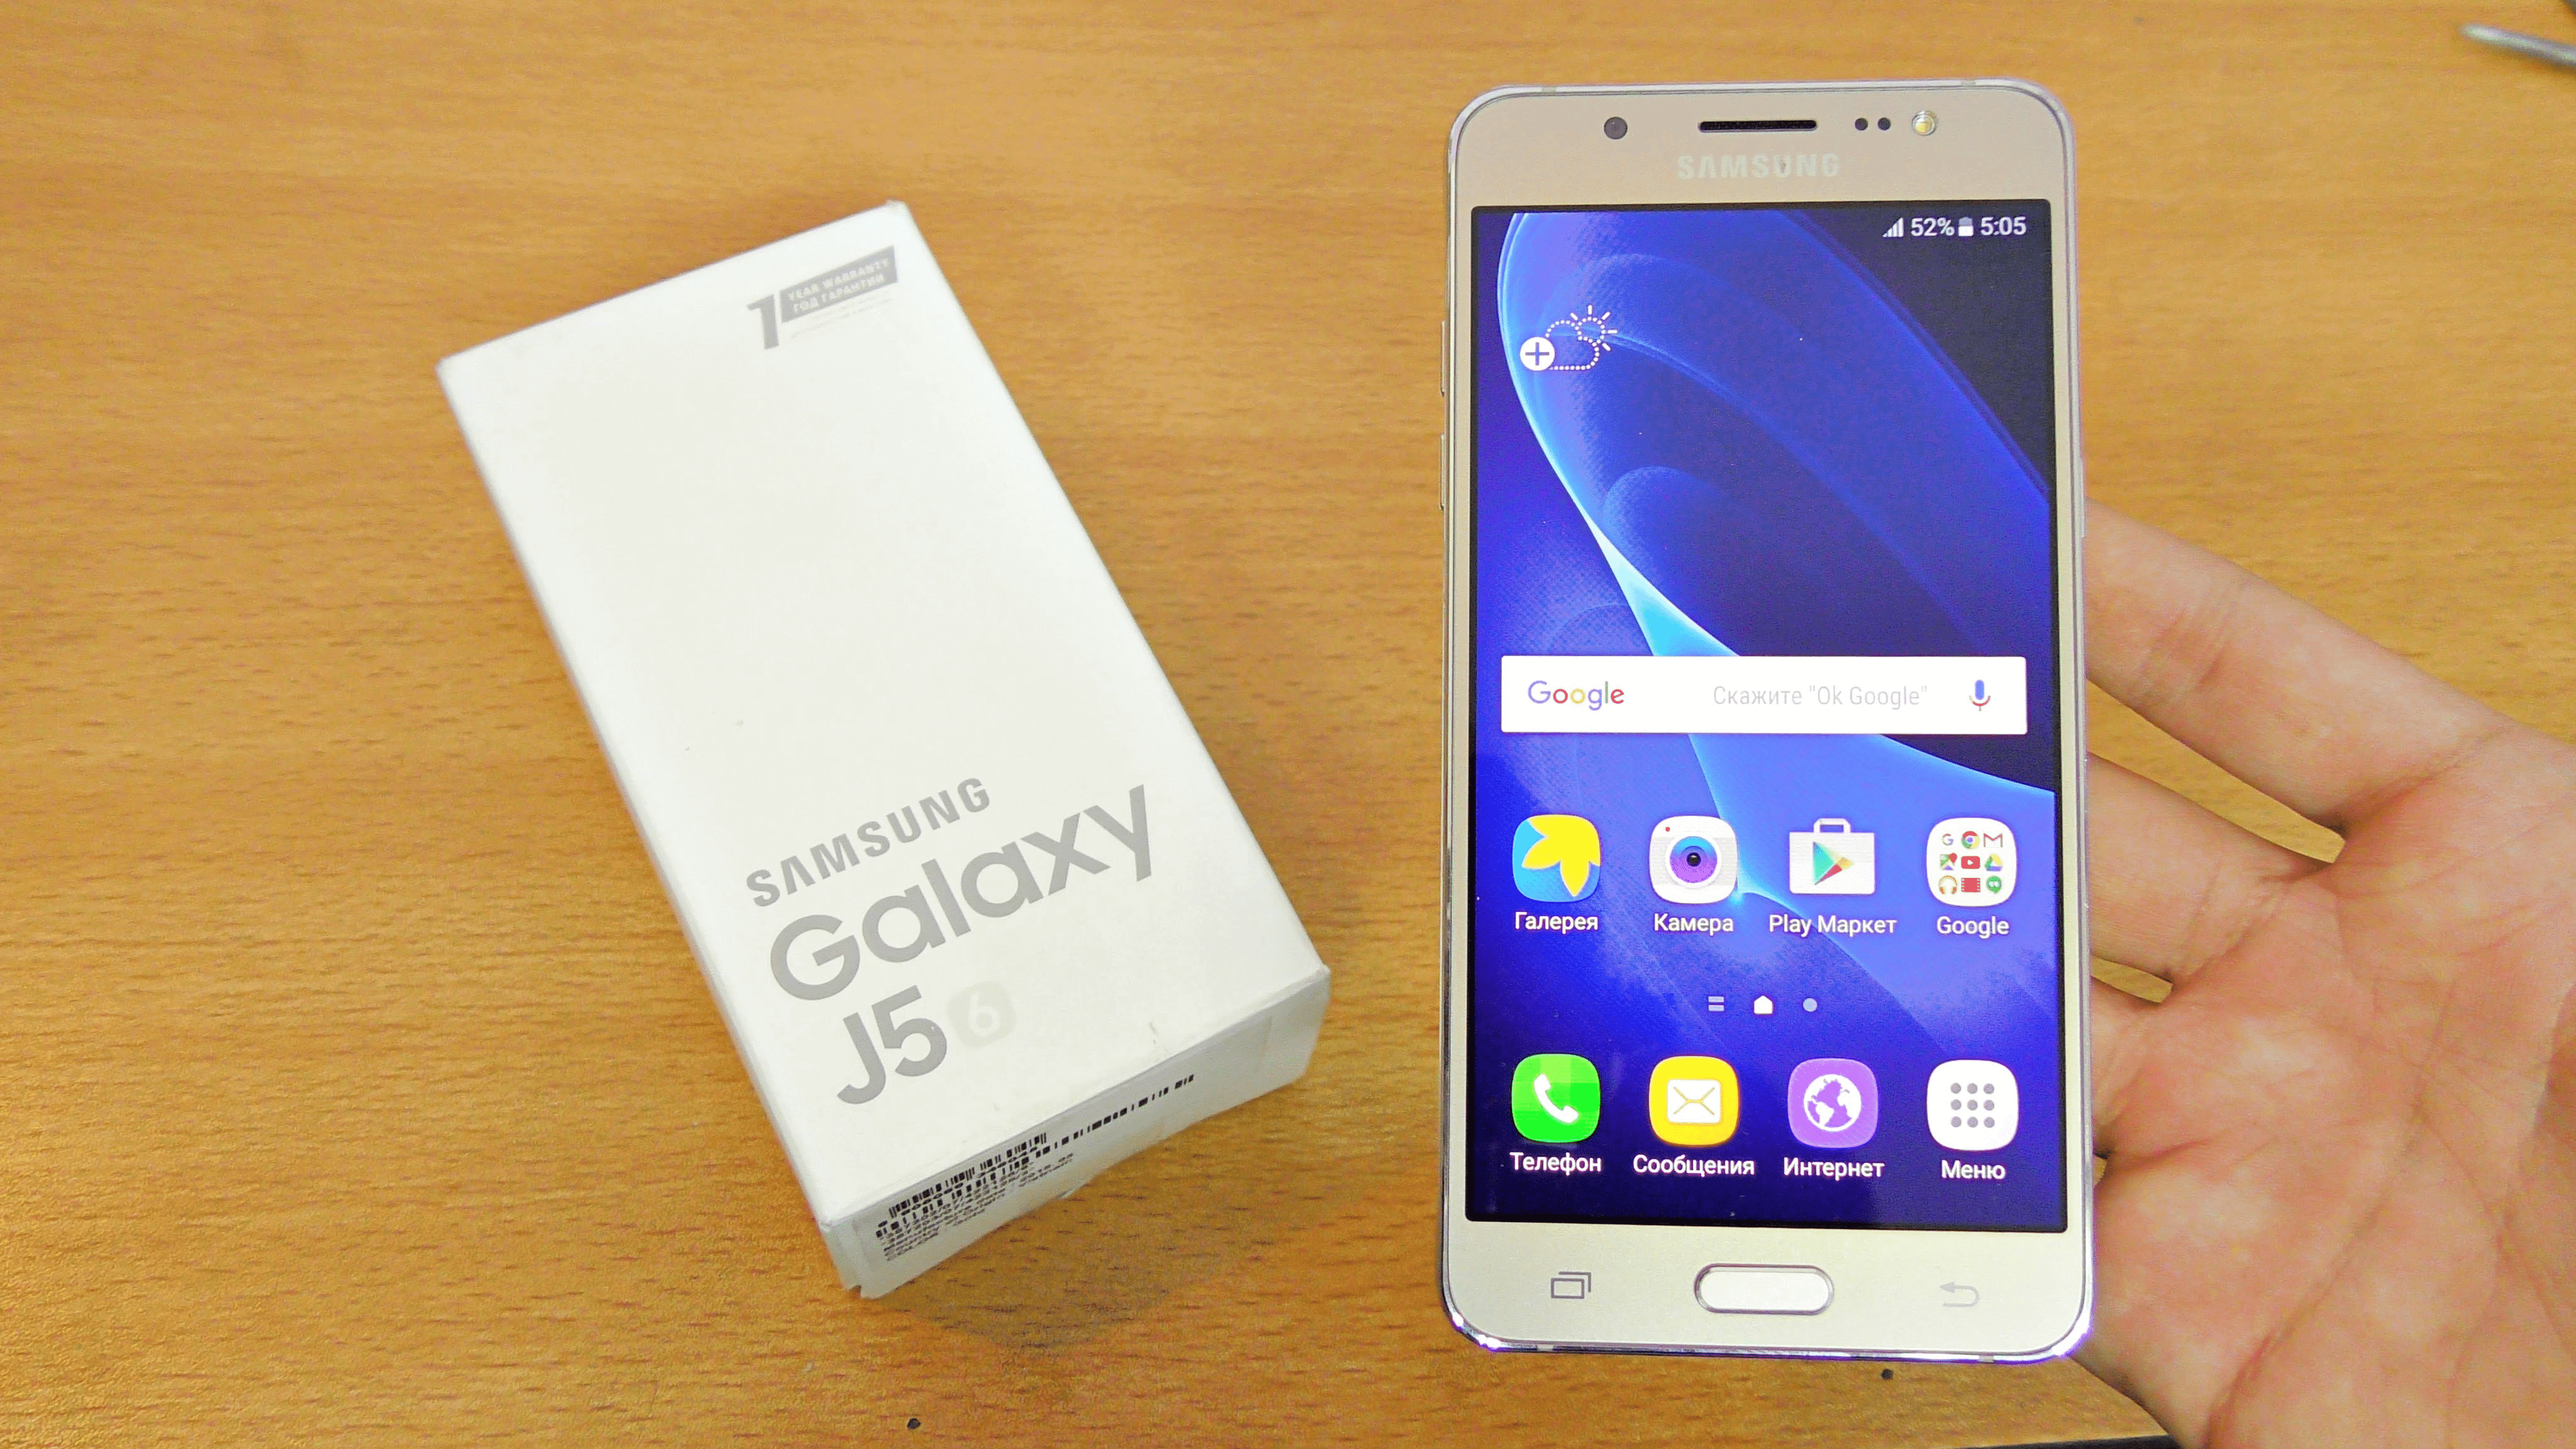 Install XXU2AQC1 Official April Security Patch On Galaxy J5 (2016) SM-J510F 1